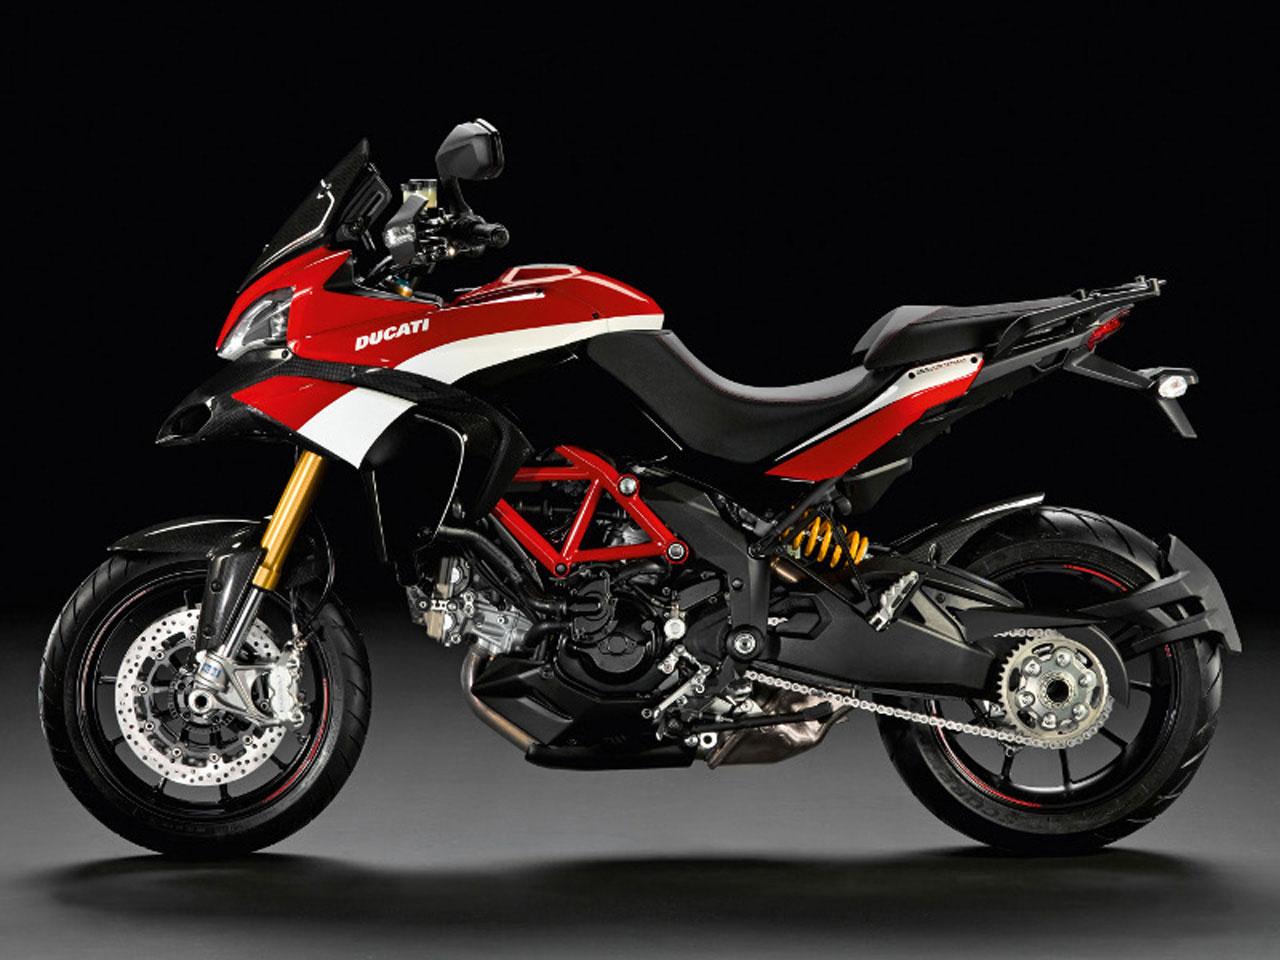 Special Edition Ducati Multistrada 1200 S Pikes Peak